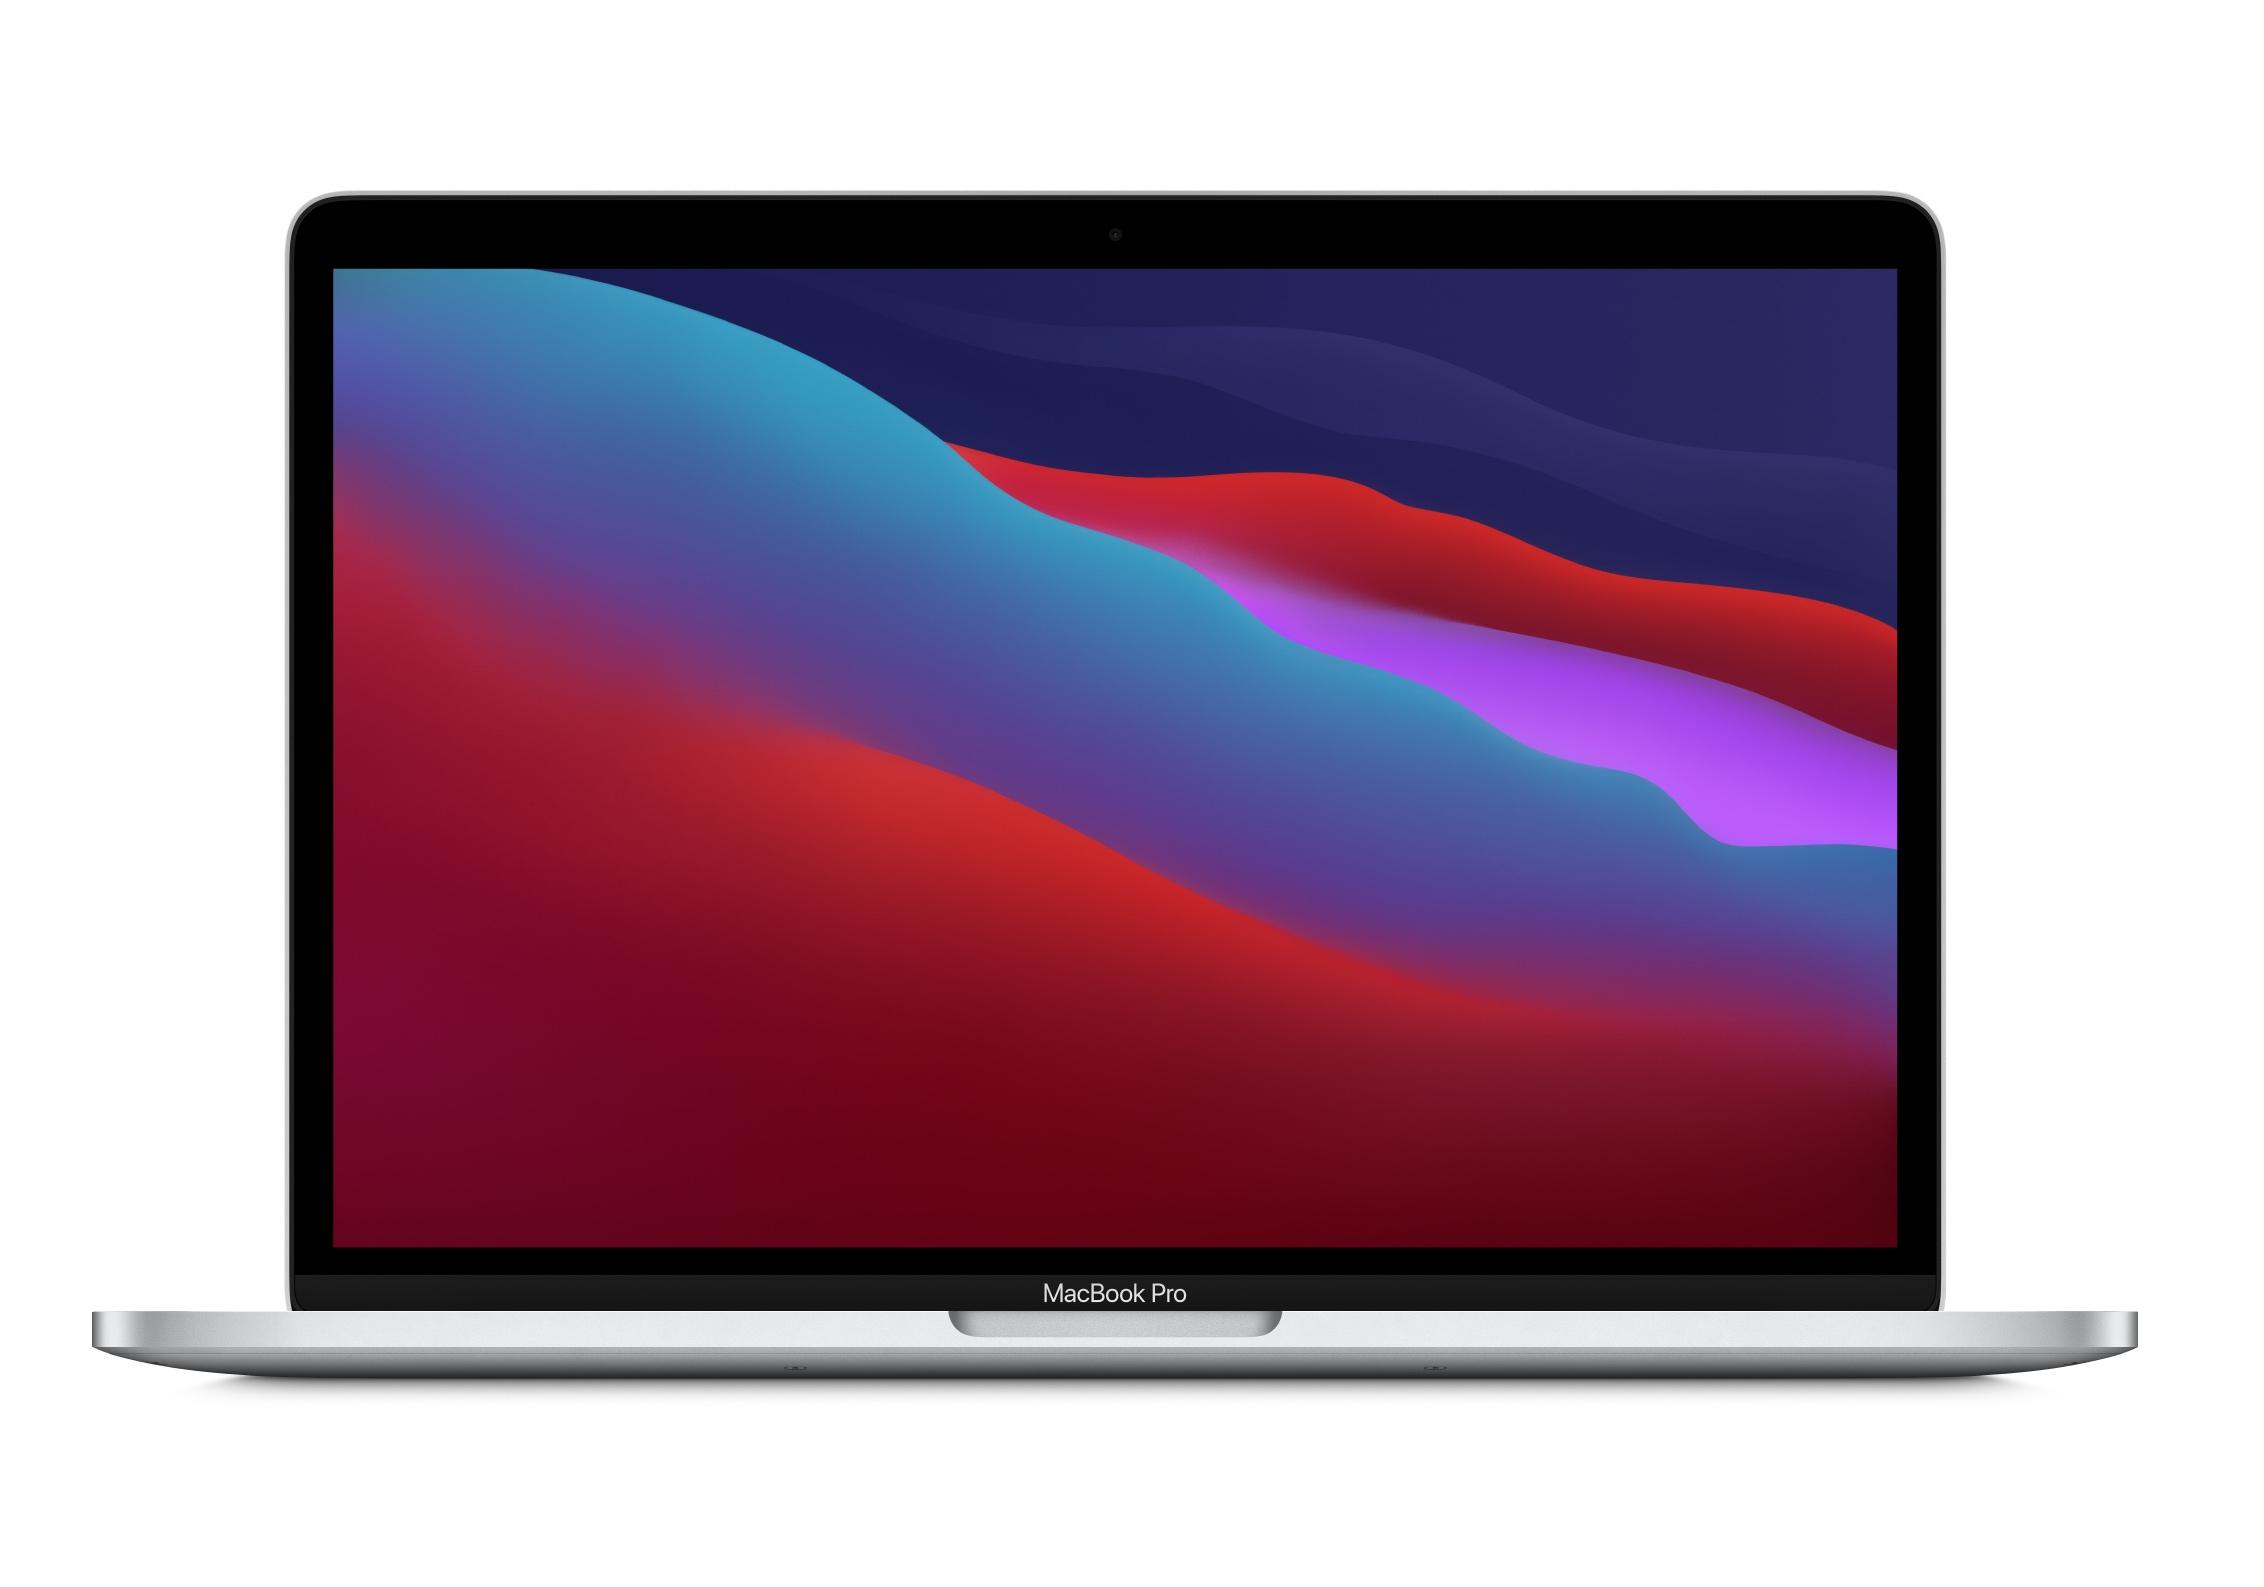 MacBook Pro (new)